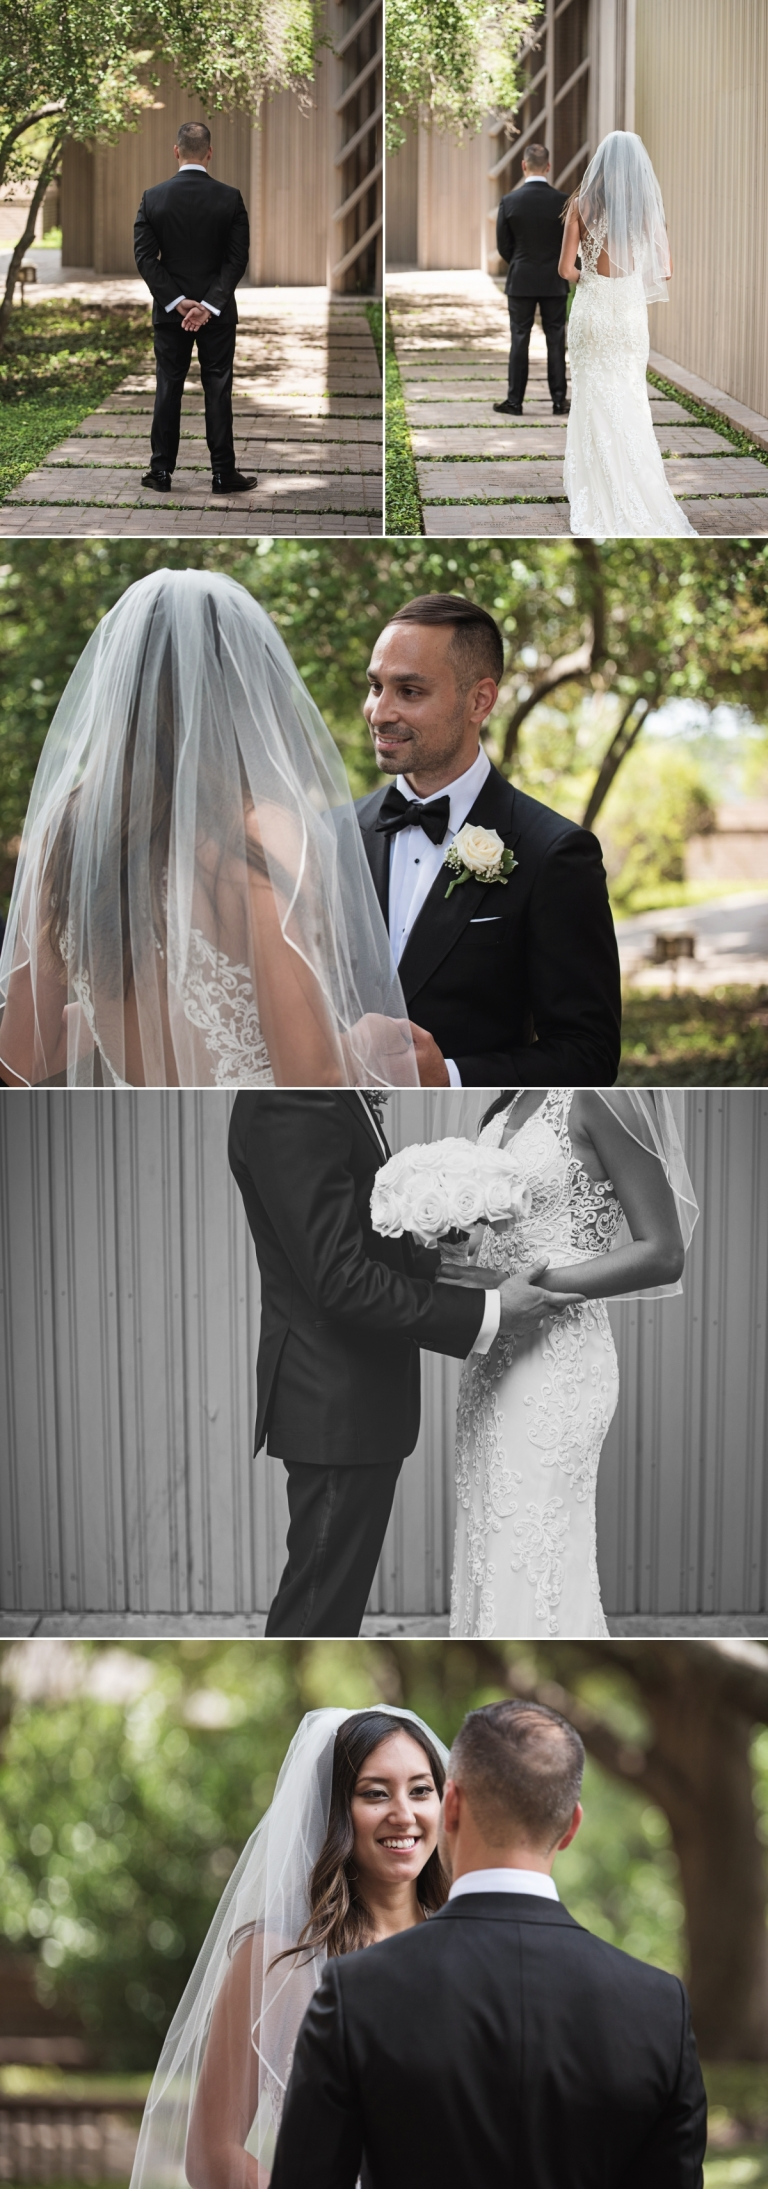 Marty Leonard Chapel Wedding in Fort Worth